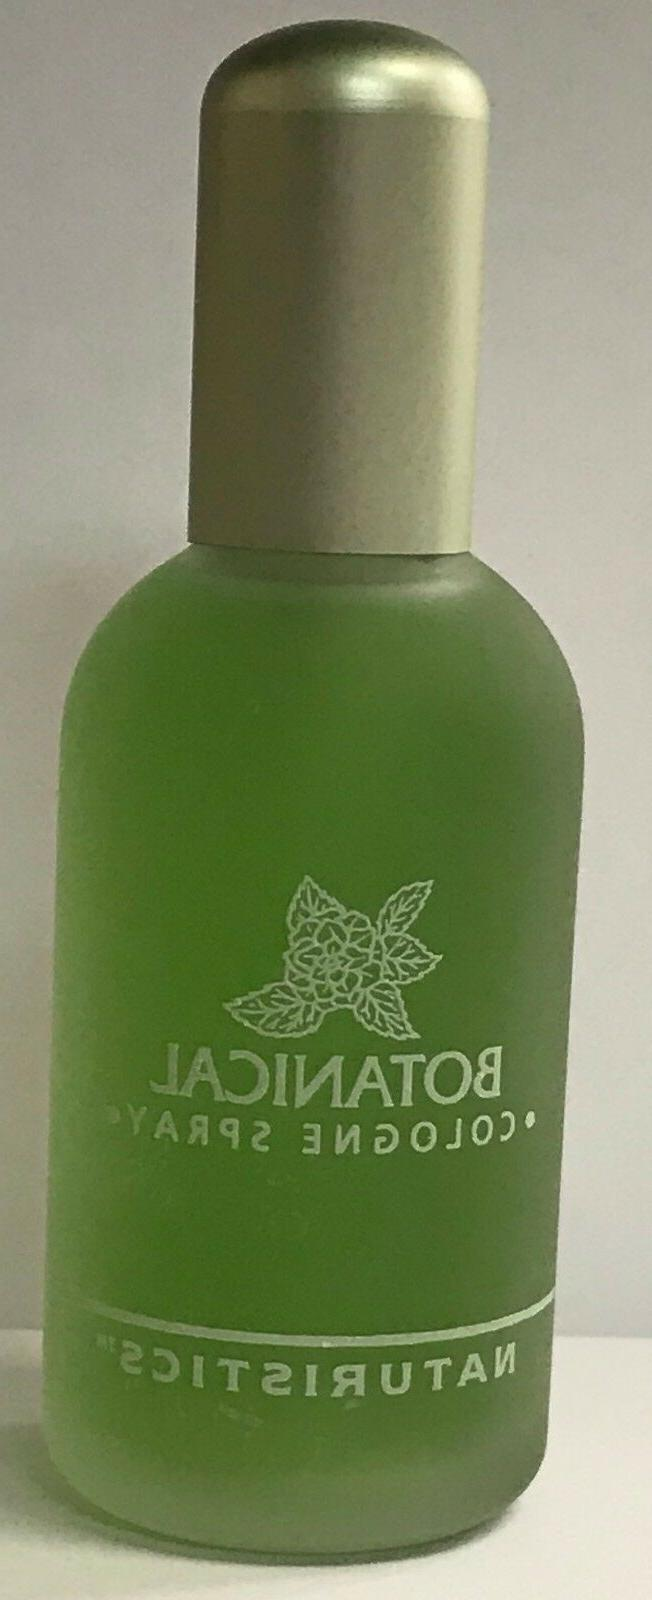 botanical cologne spray unboxed 1 8 fl